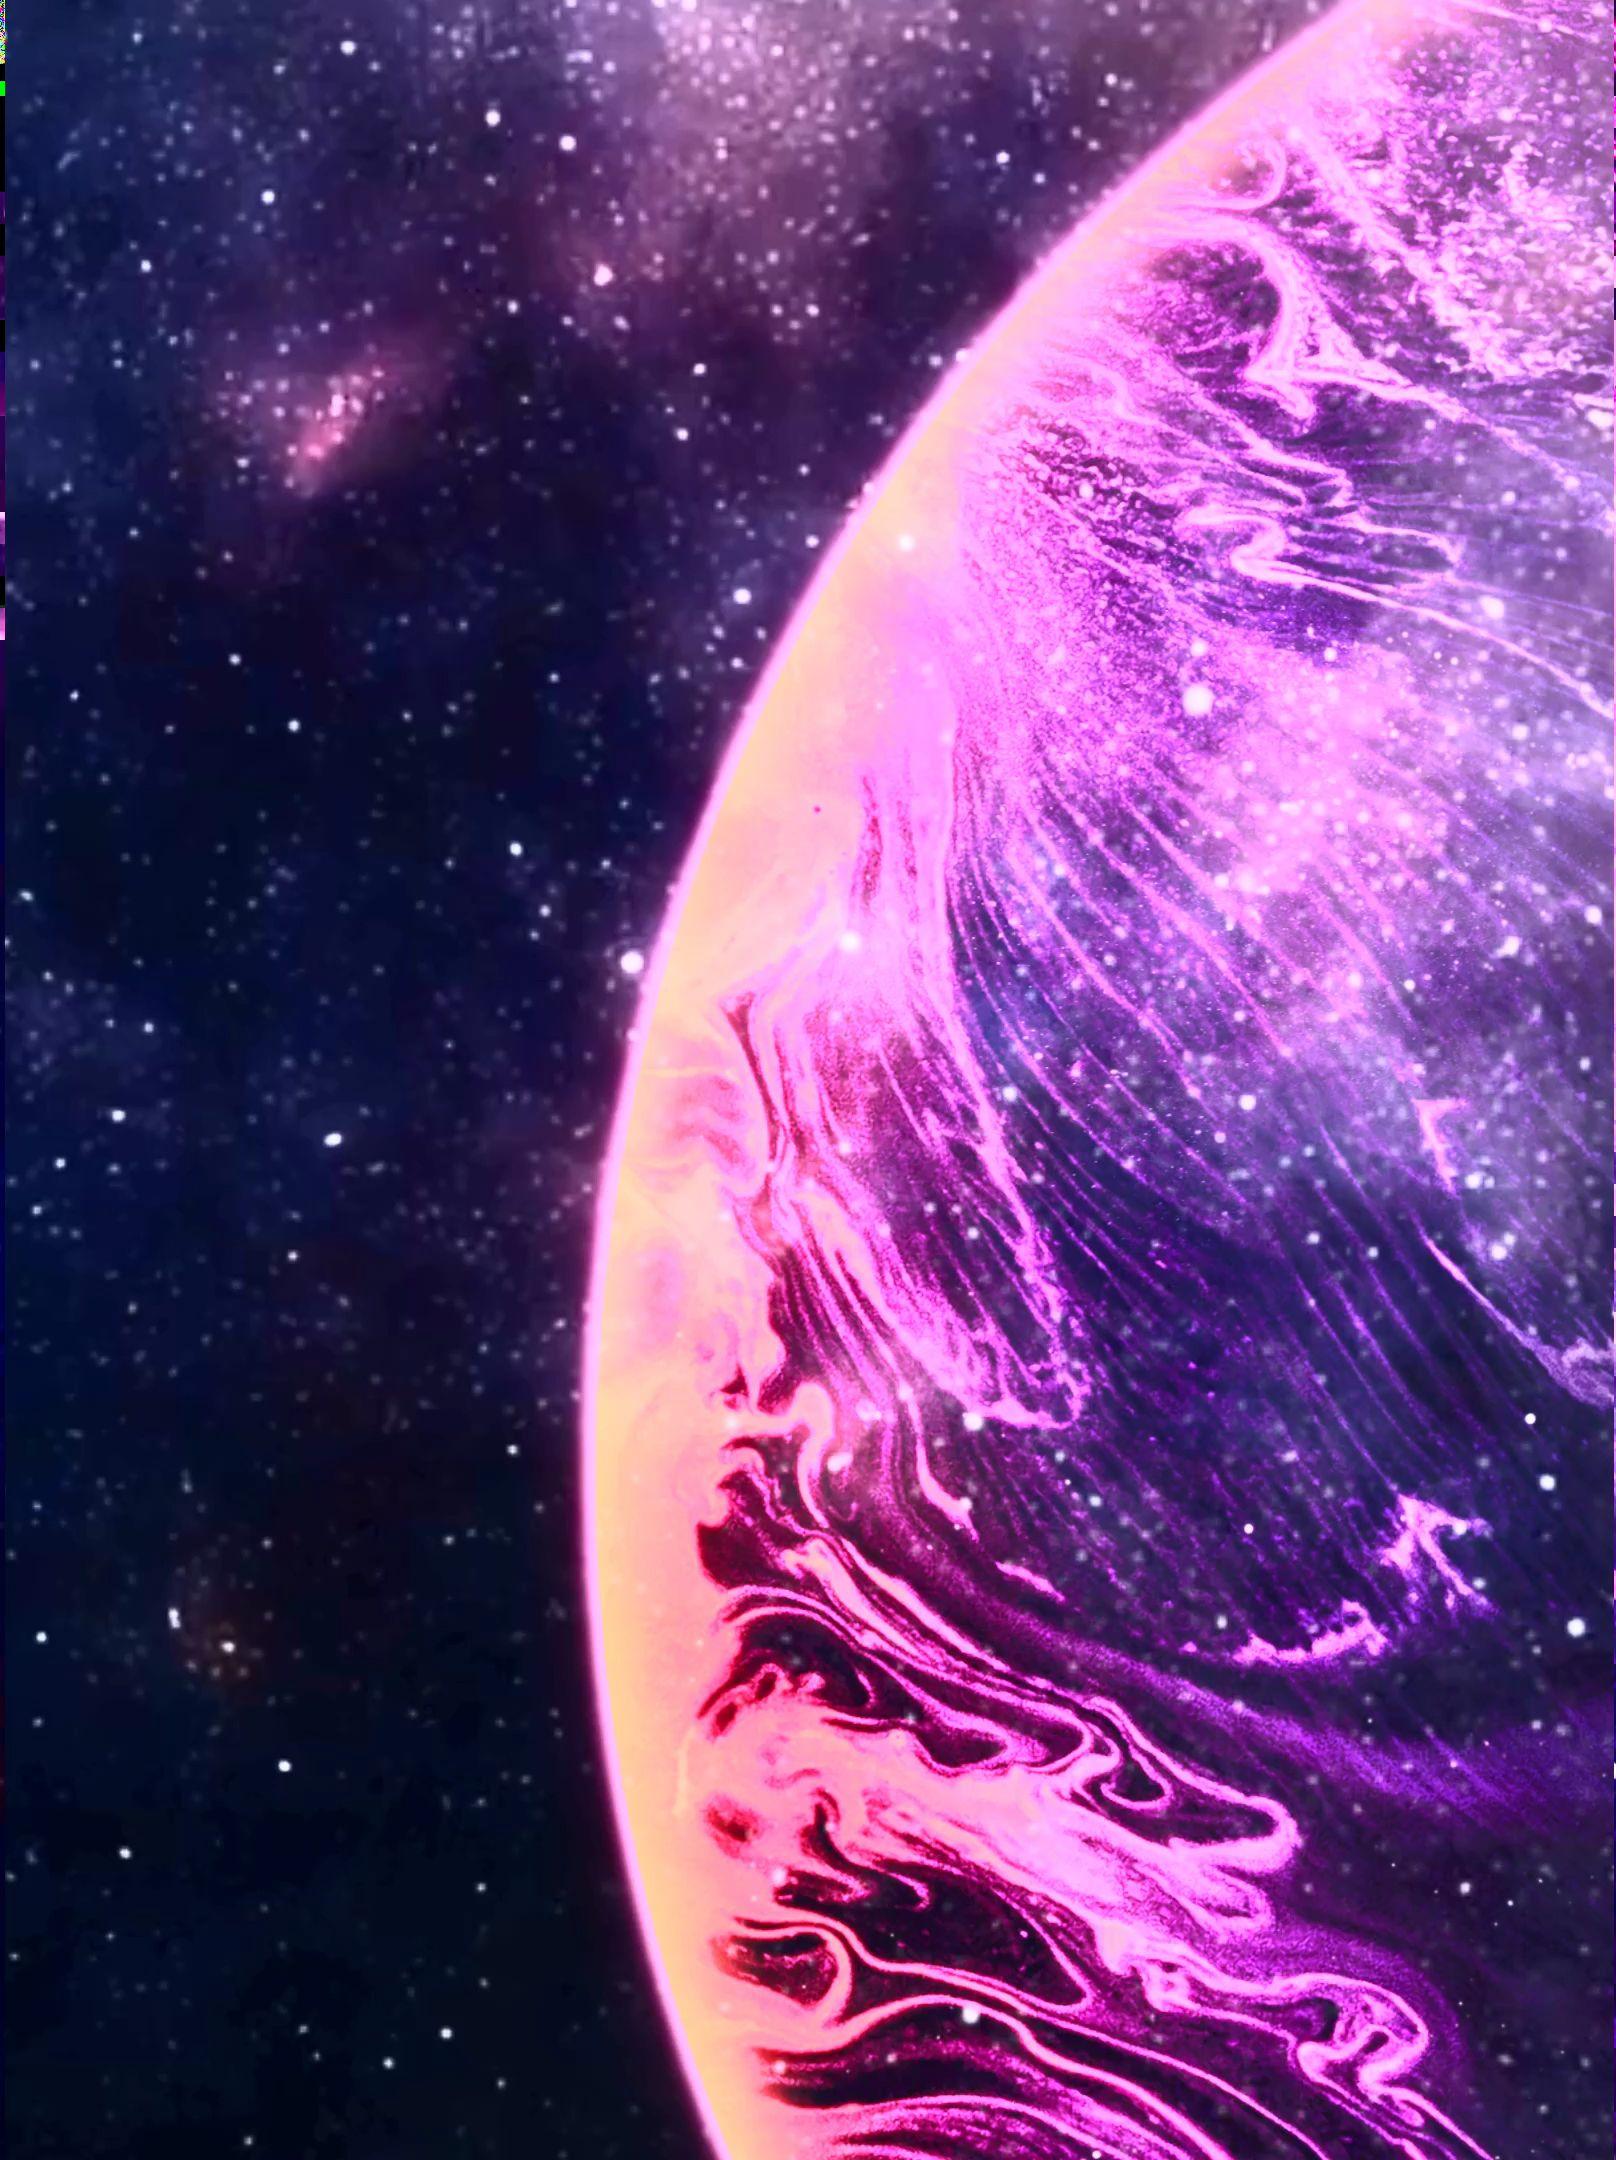 Planet Galaxy Video Galaxy Art Aesthetic Galaxy Planets Wallpaper Galaxy wallpaper live photo